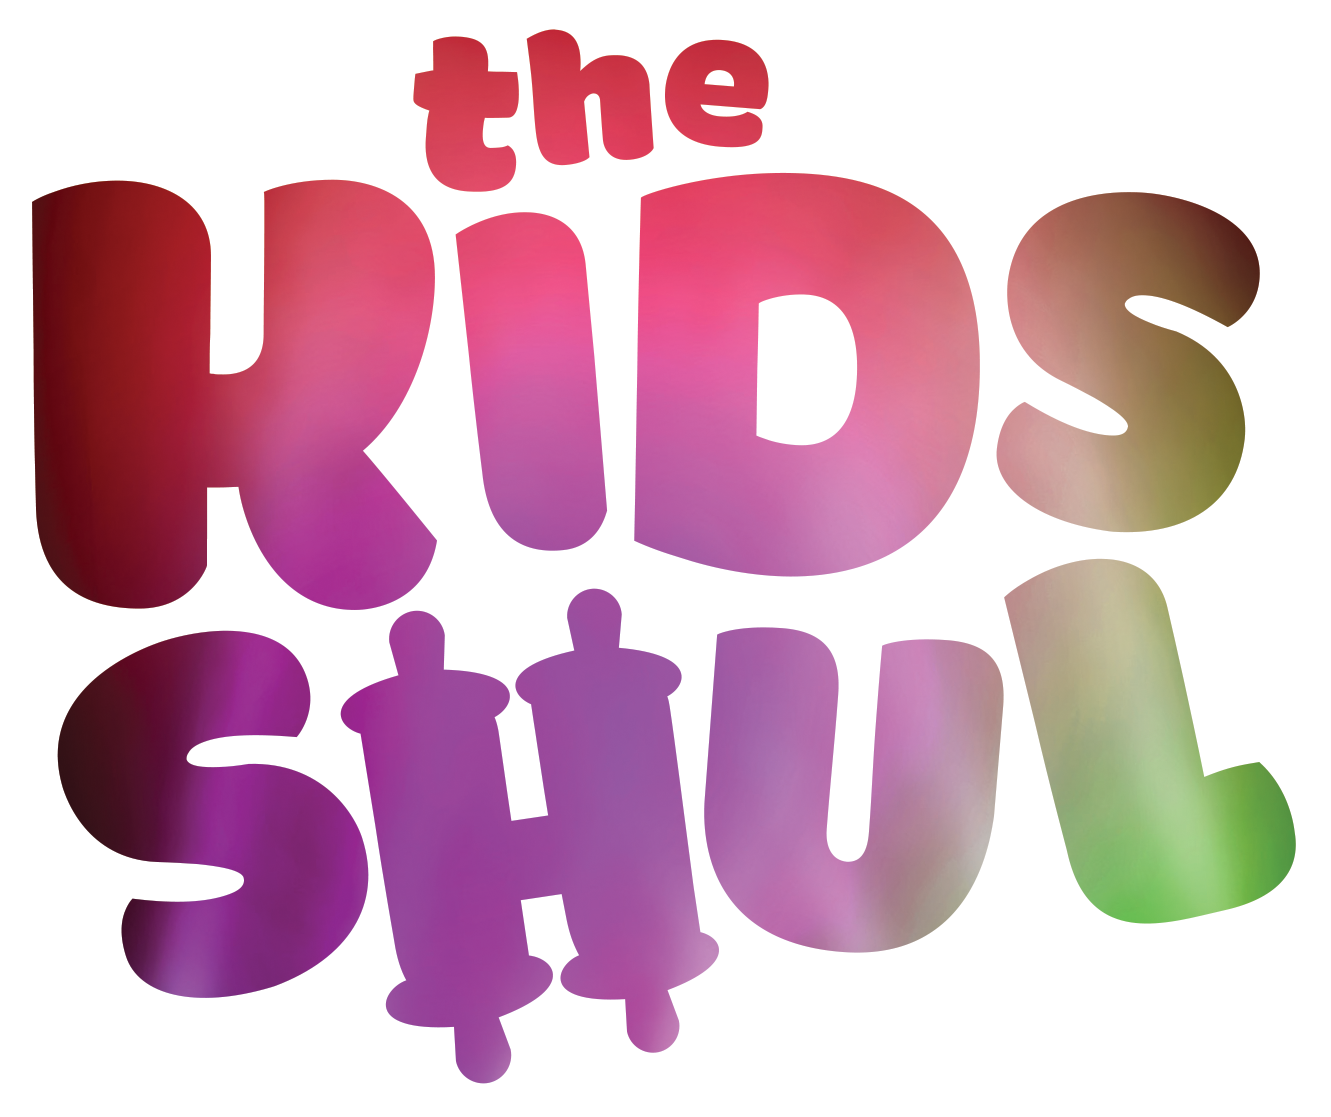 kids shul logo.png